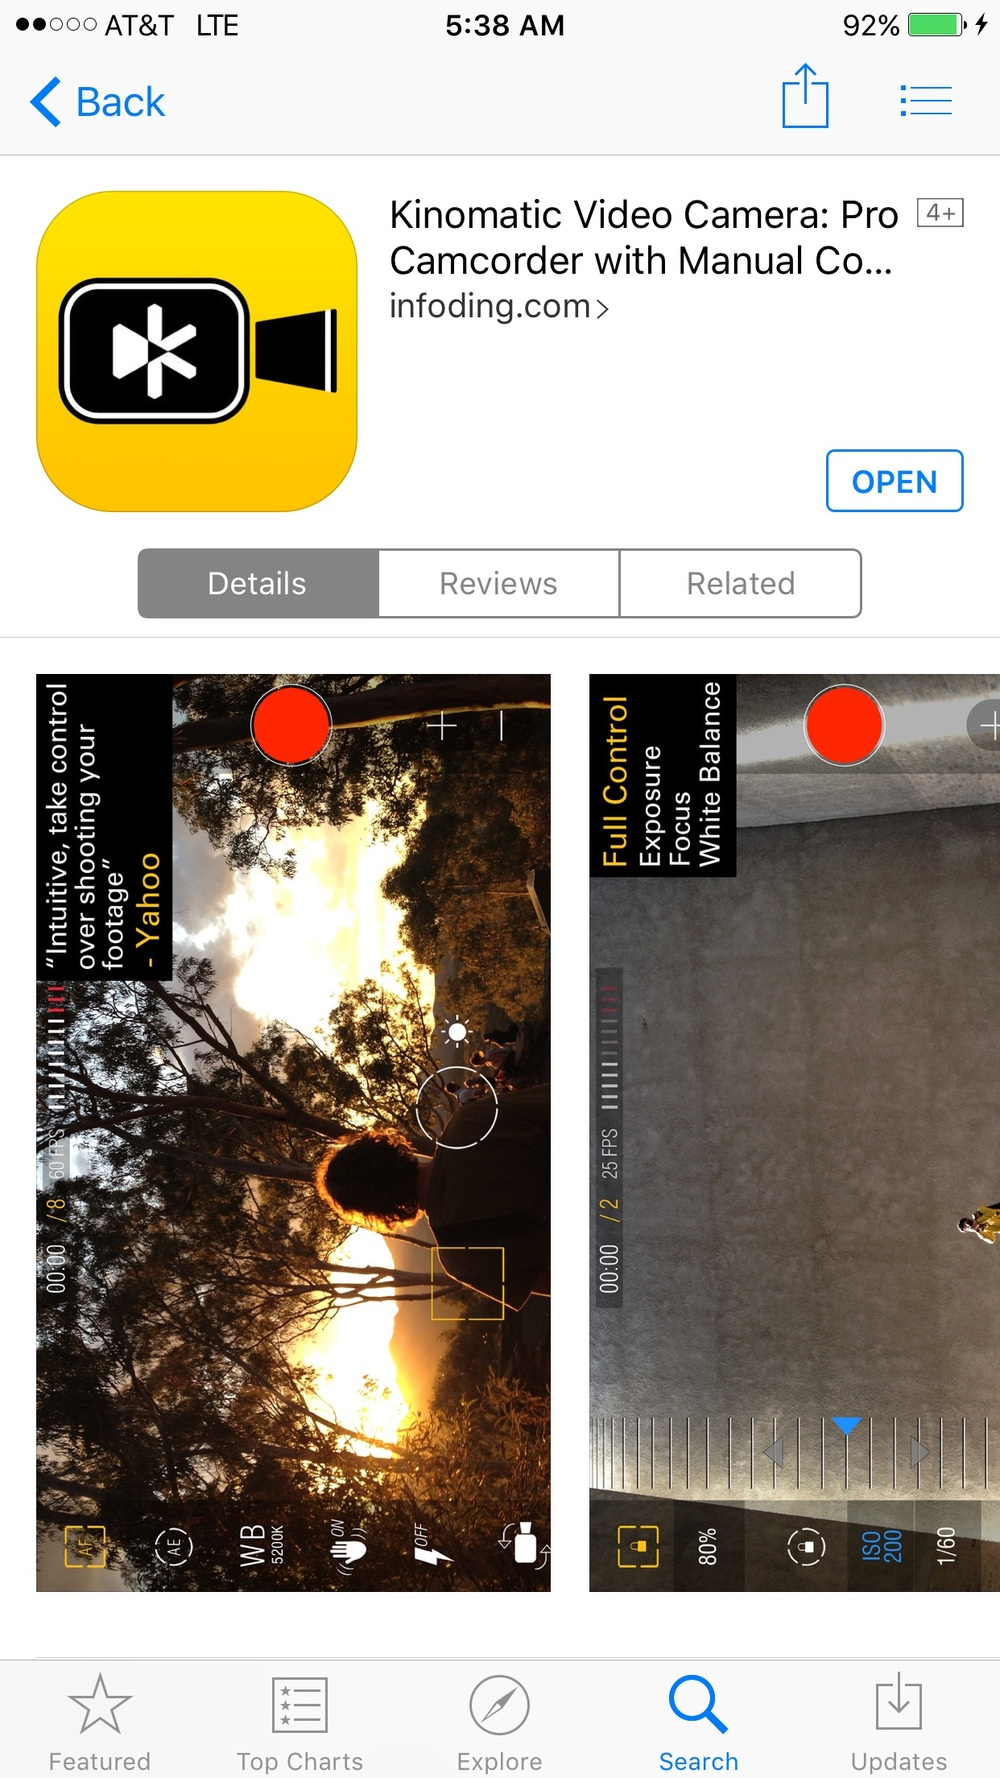 Kinomatic iOS app